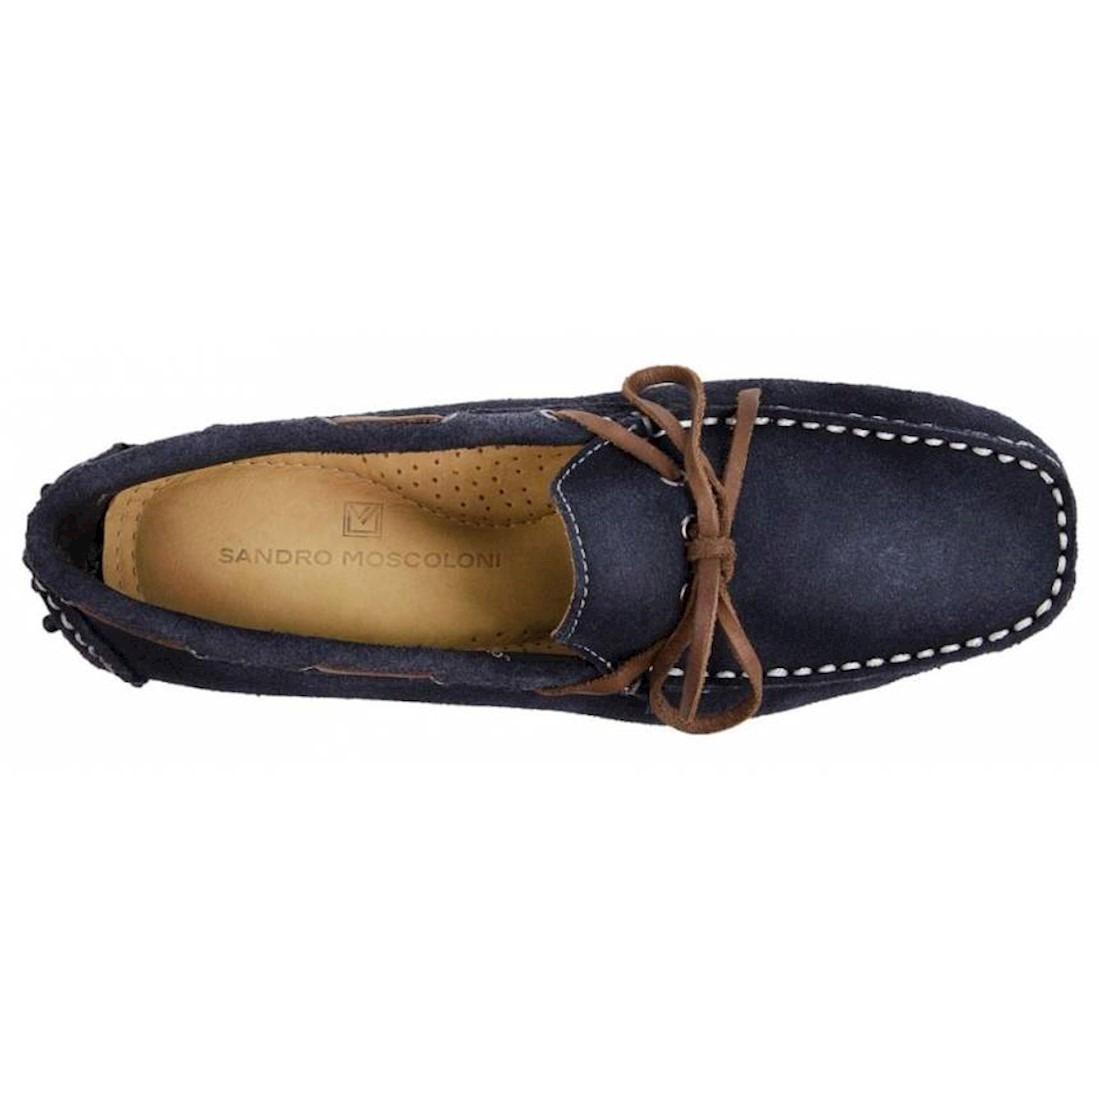 5bb859d757 Carregando zoom... sapato masculino driver sandro moscoloni akron azul  marinho